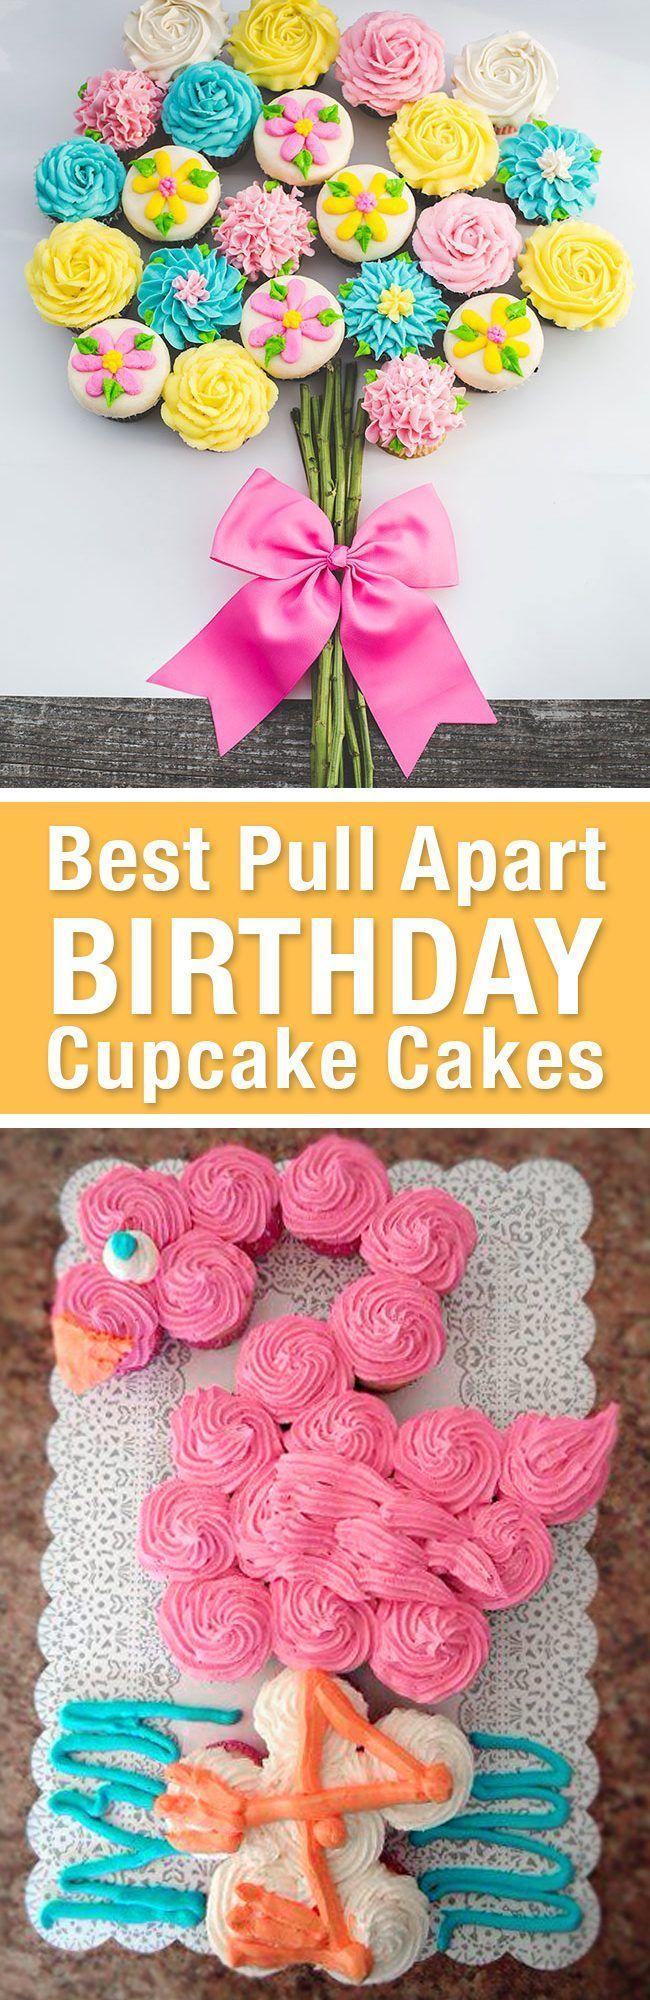 Best Birthday Pull Apart Cupcake Cakes Simple creative cake